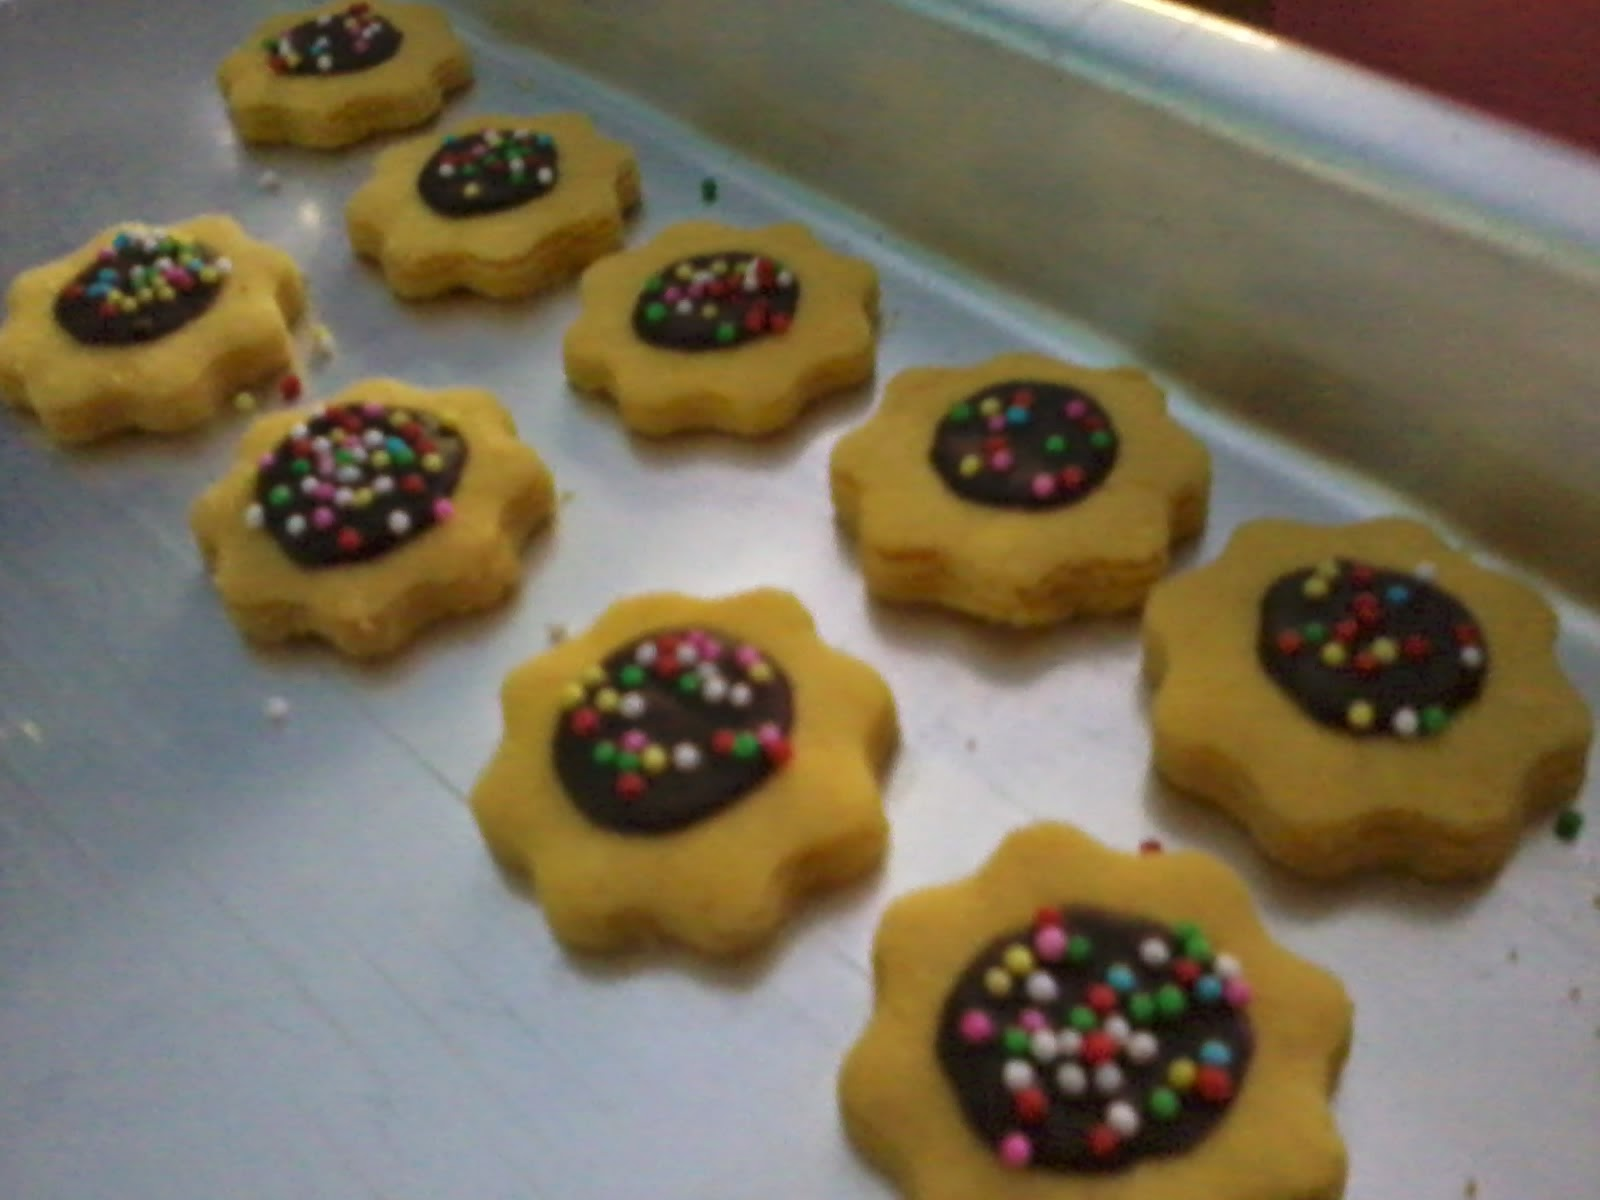 flower shaped cookies,flower biscuit